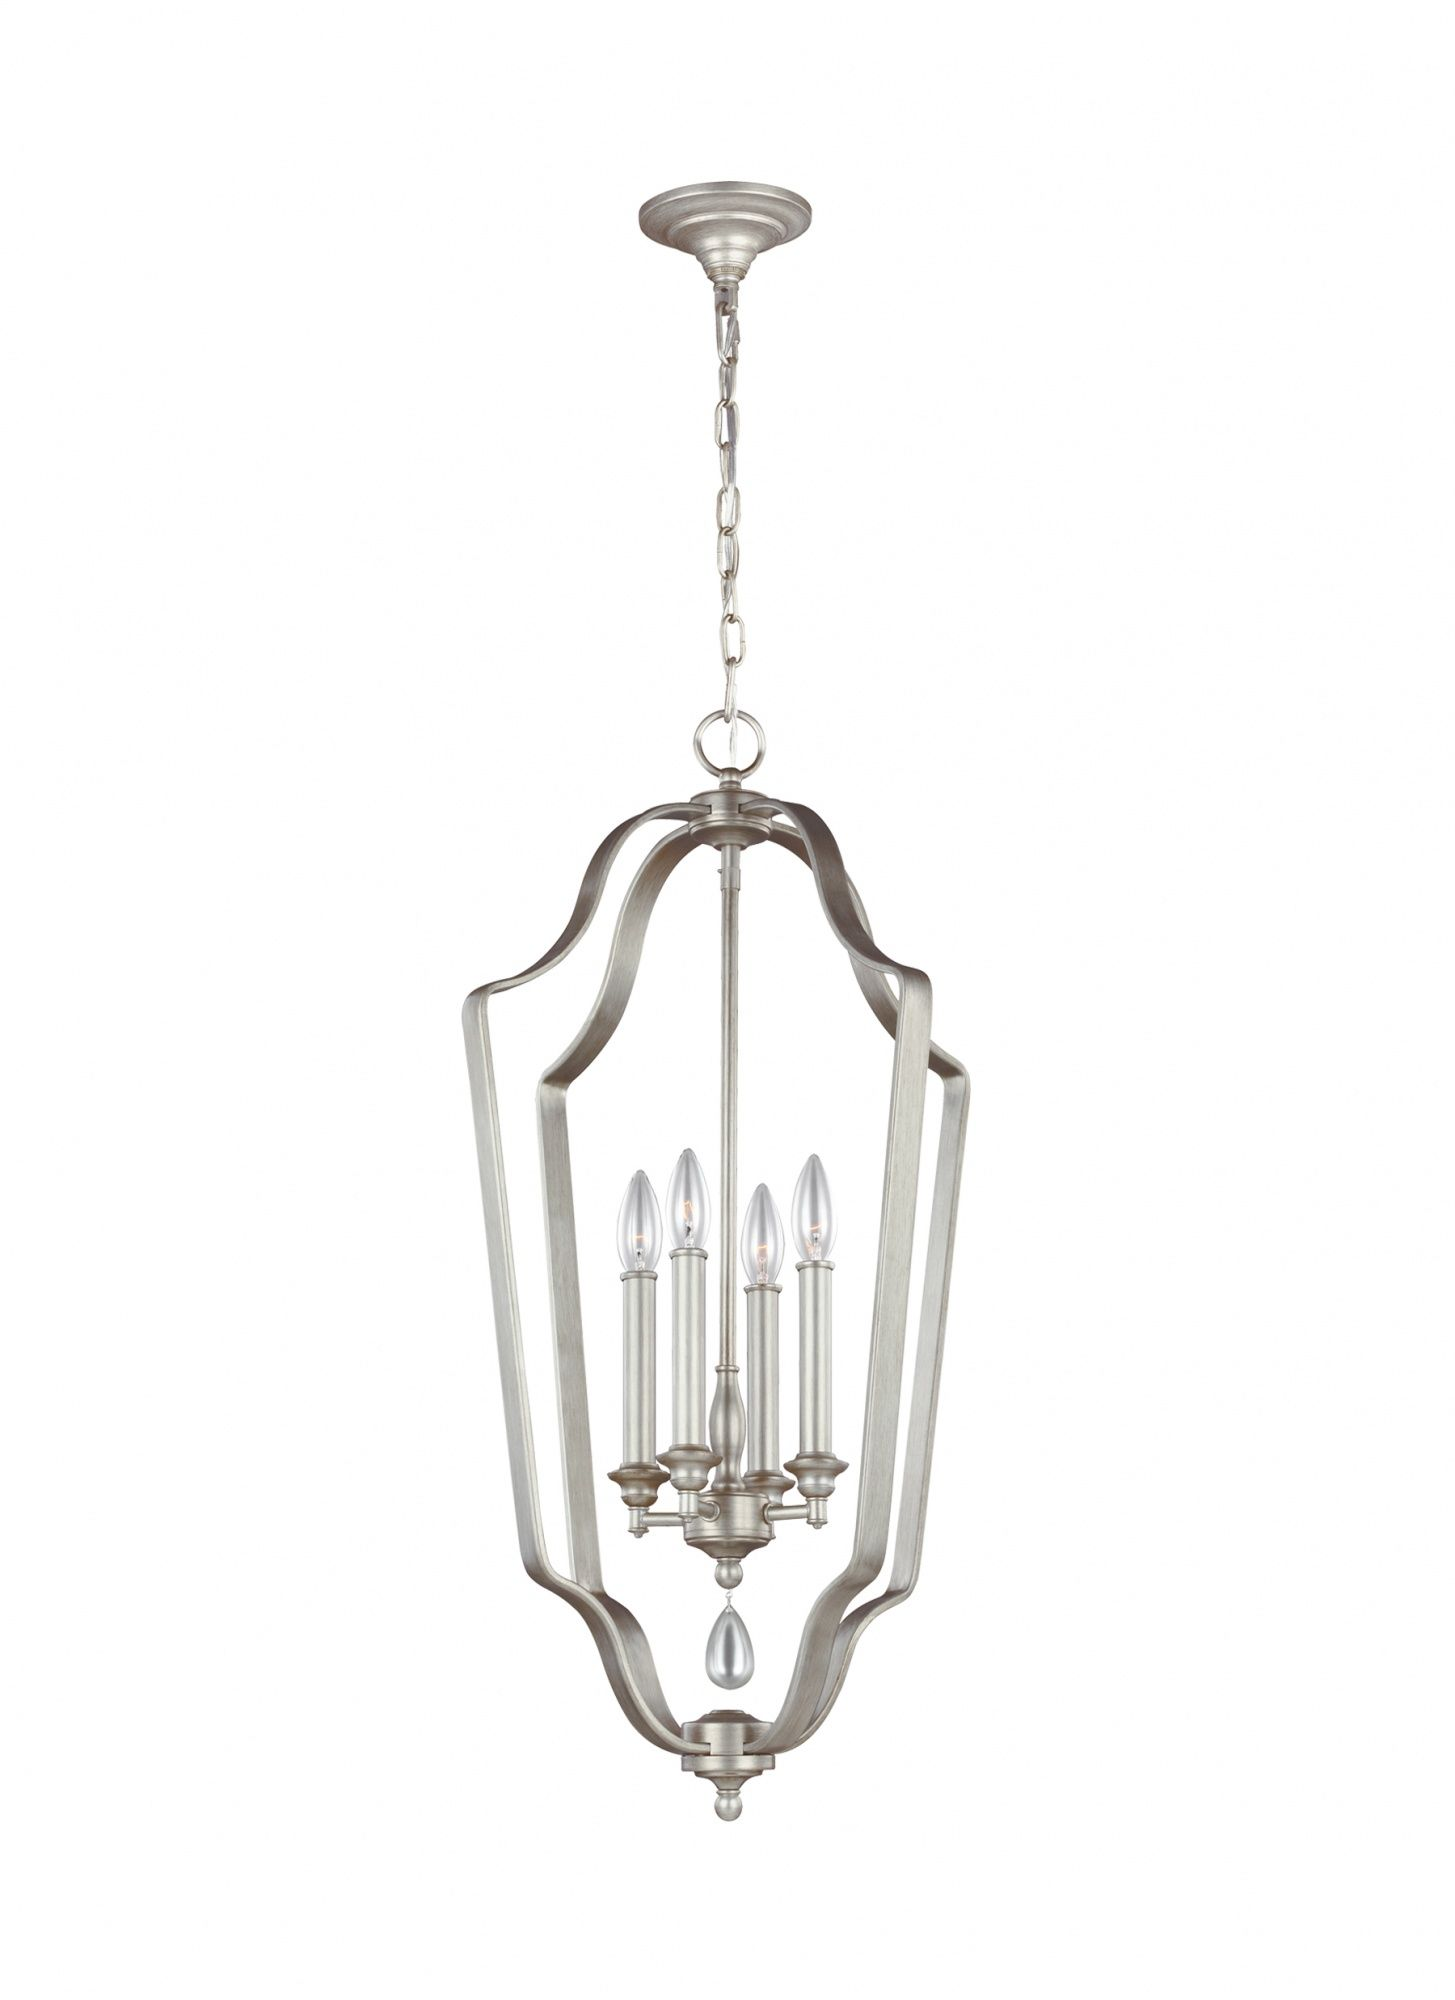 Żyrandol Dewitt FE/DEWITT/4P Feiss srebrna oprawa w dekoracyjnym stylu